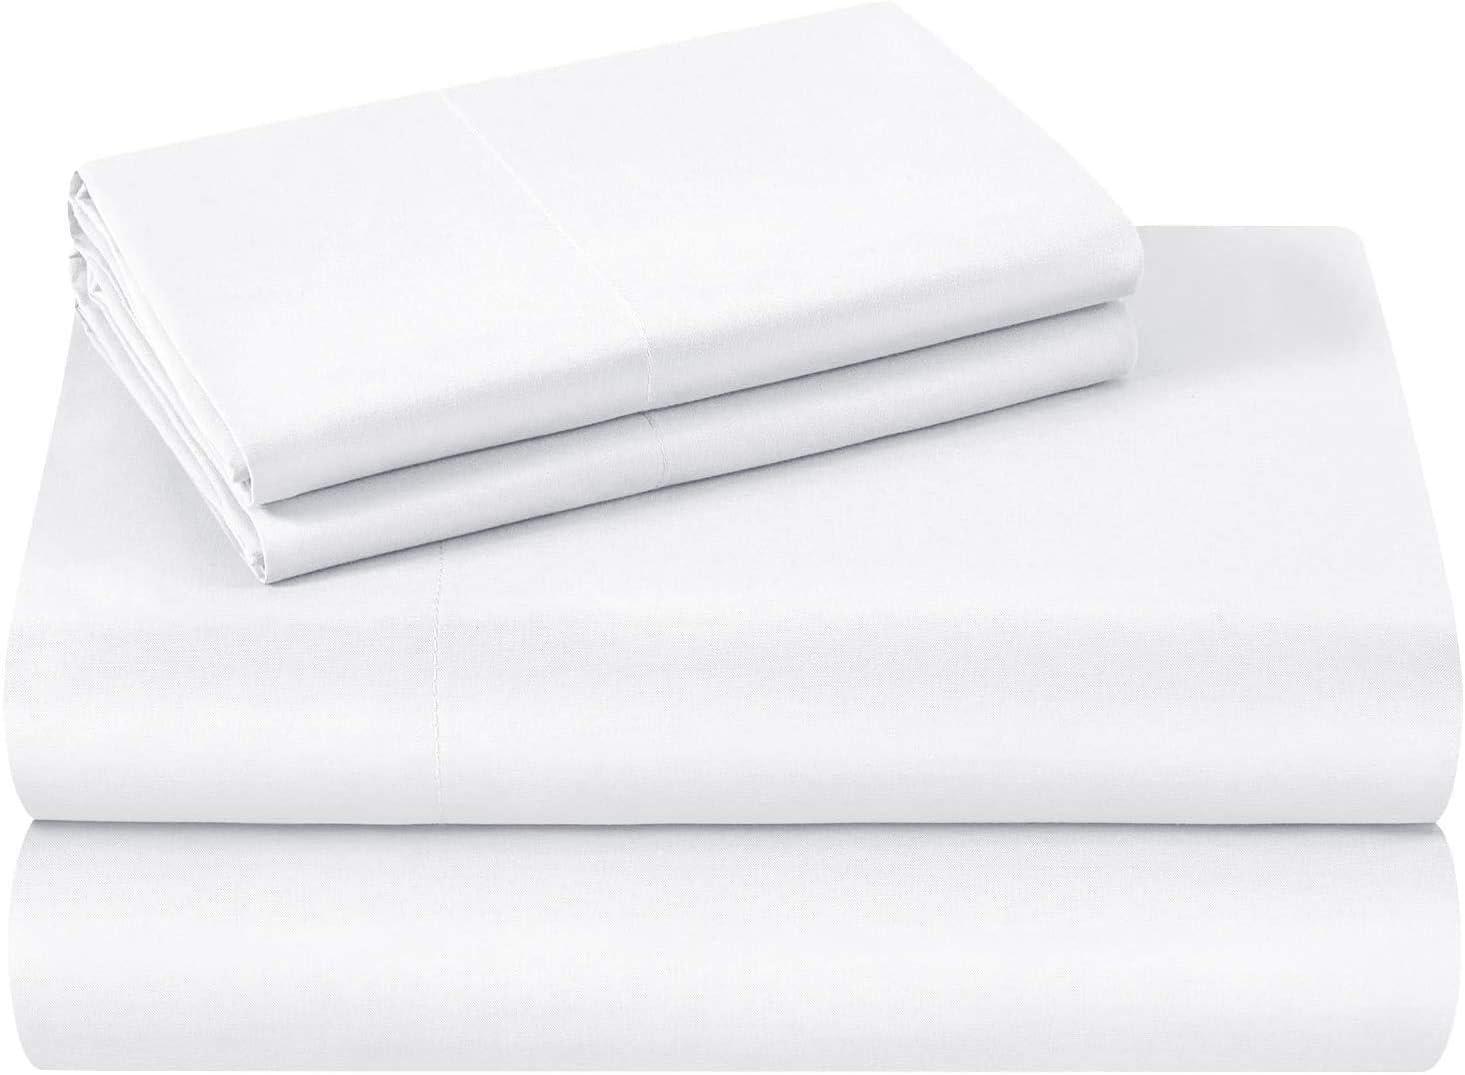 4 Piece Premium Sheet Set-Cotton Bed Sheets Twin Size